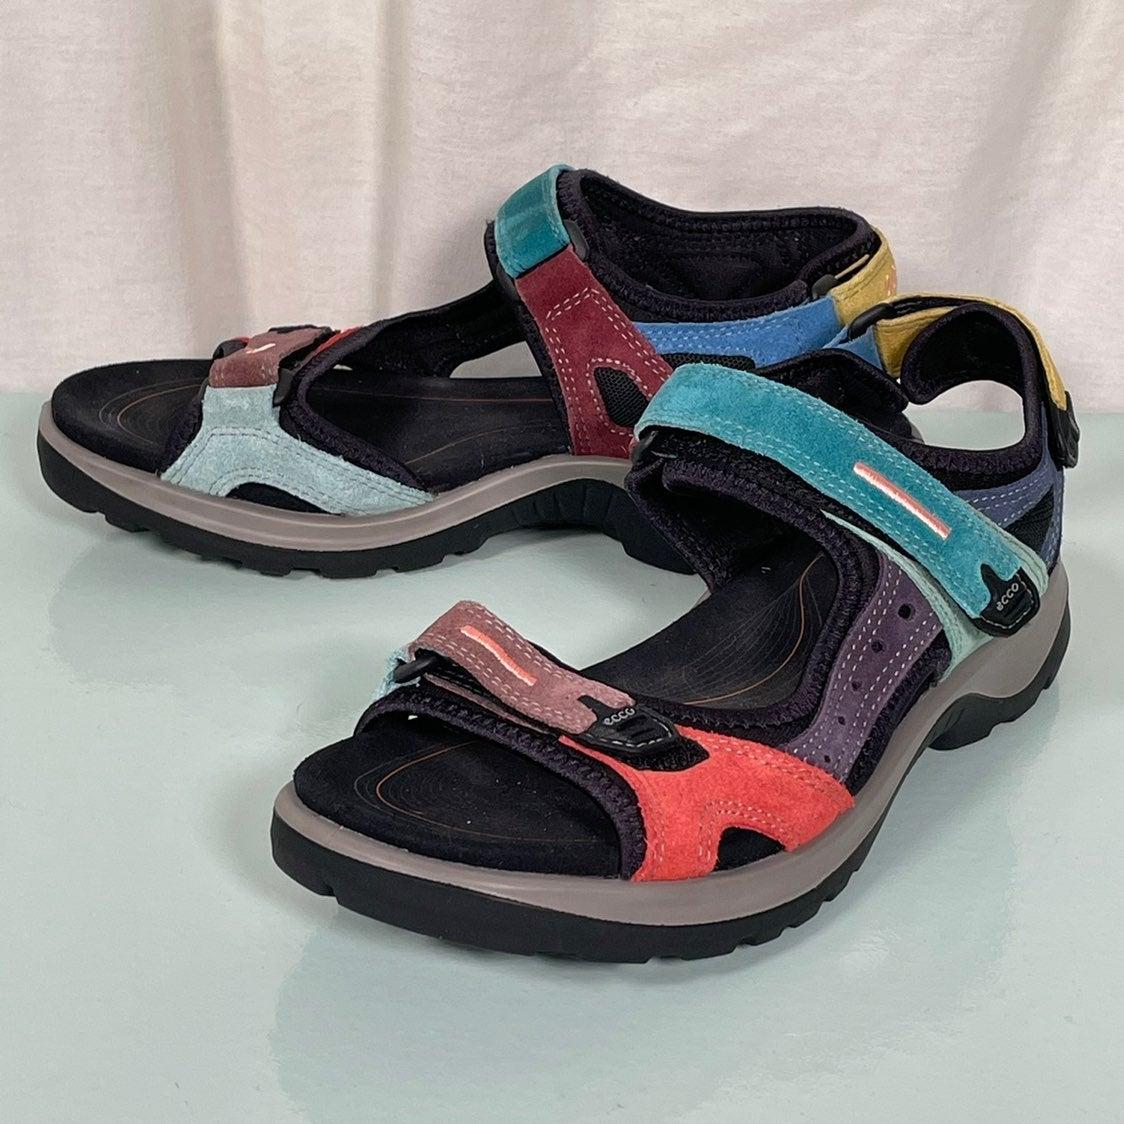 Ecco Off-road Multicolor Women's Sandal